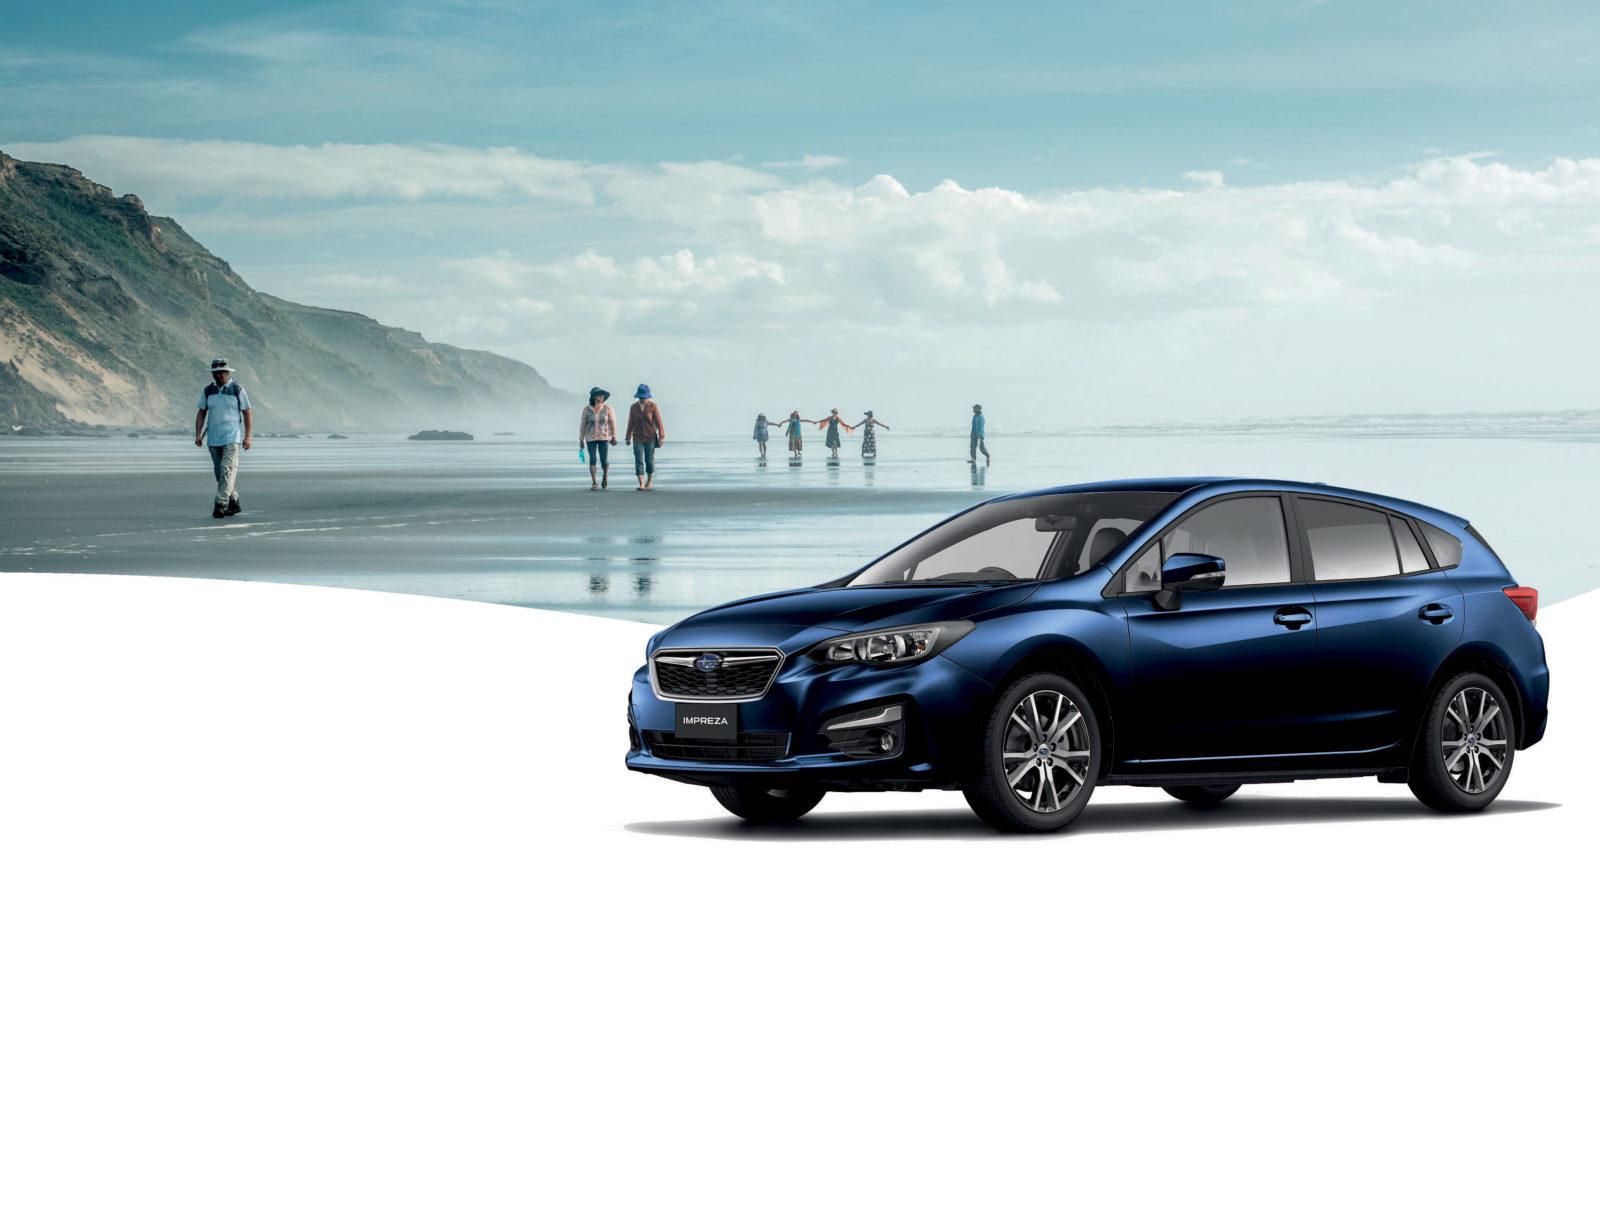 Subaru Nz New Used Sales Service Parts Winger Nz